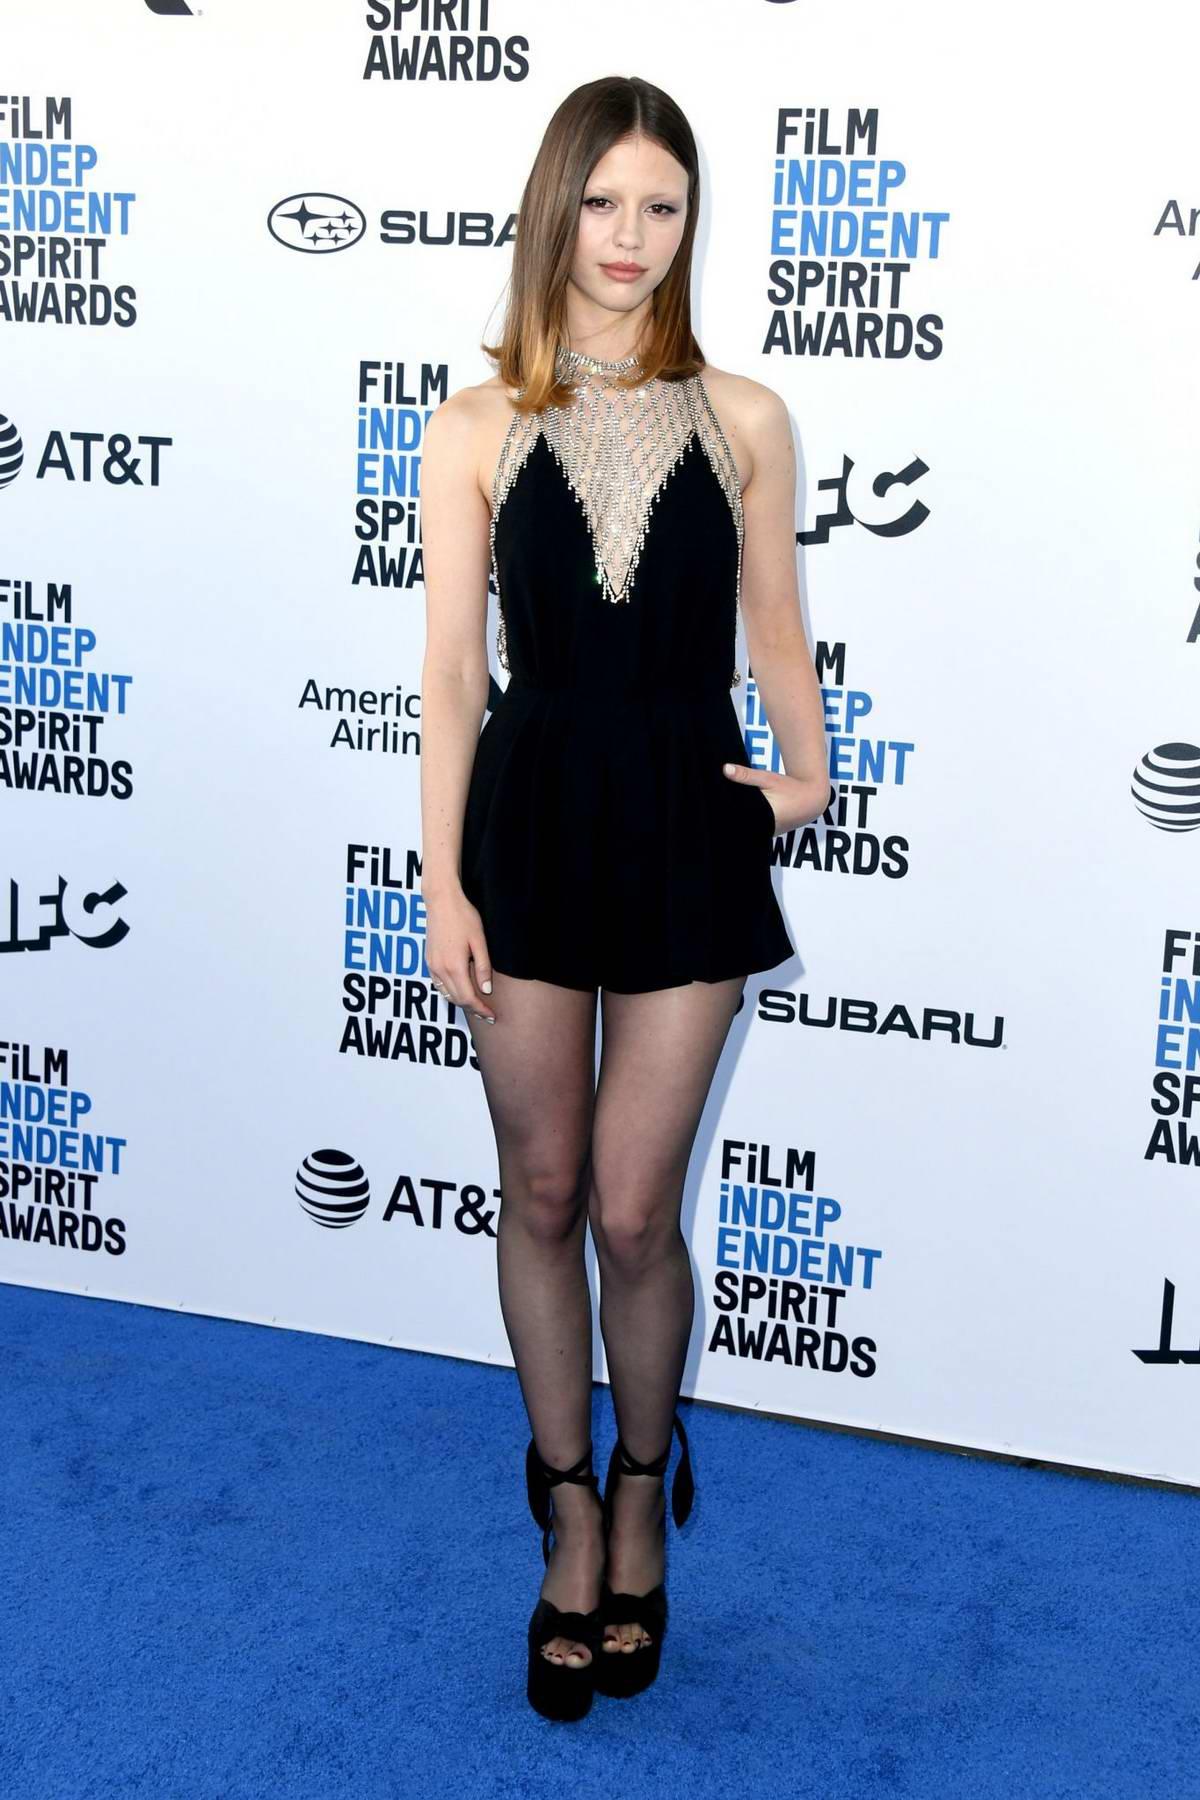 Mia Goth attends the 34th Film Independent Spirit Awards in Santa Monica, California